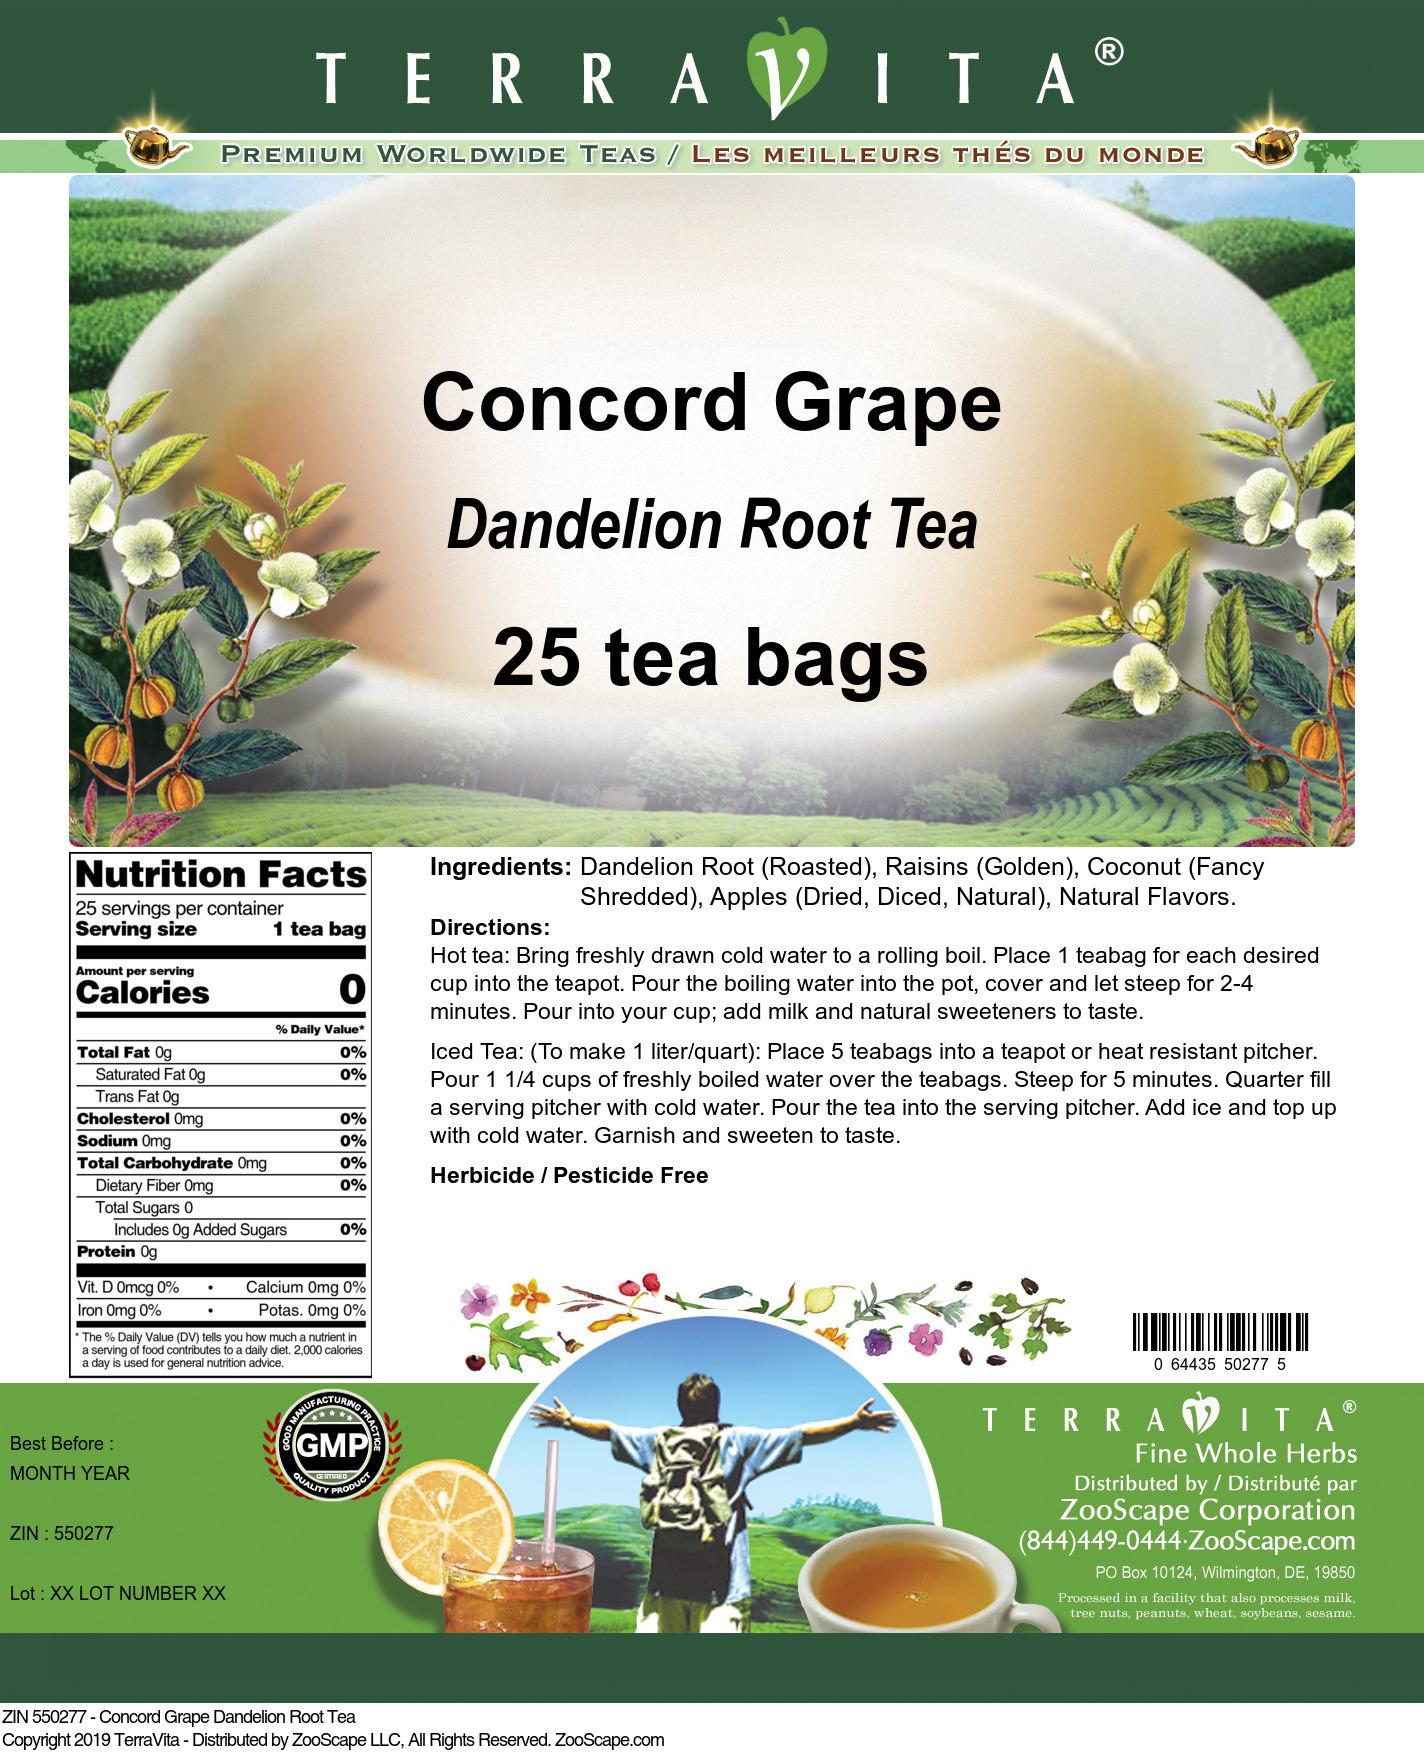 Concord Grape Dandelion Root Tea